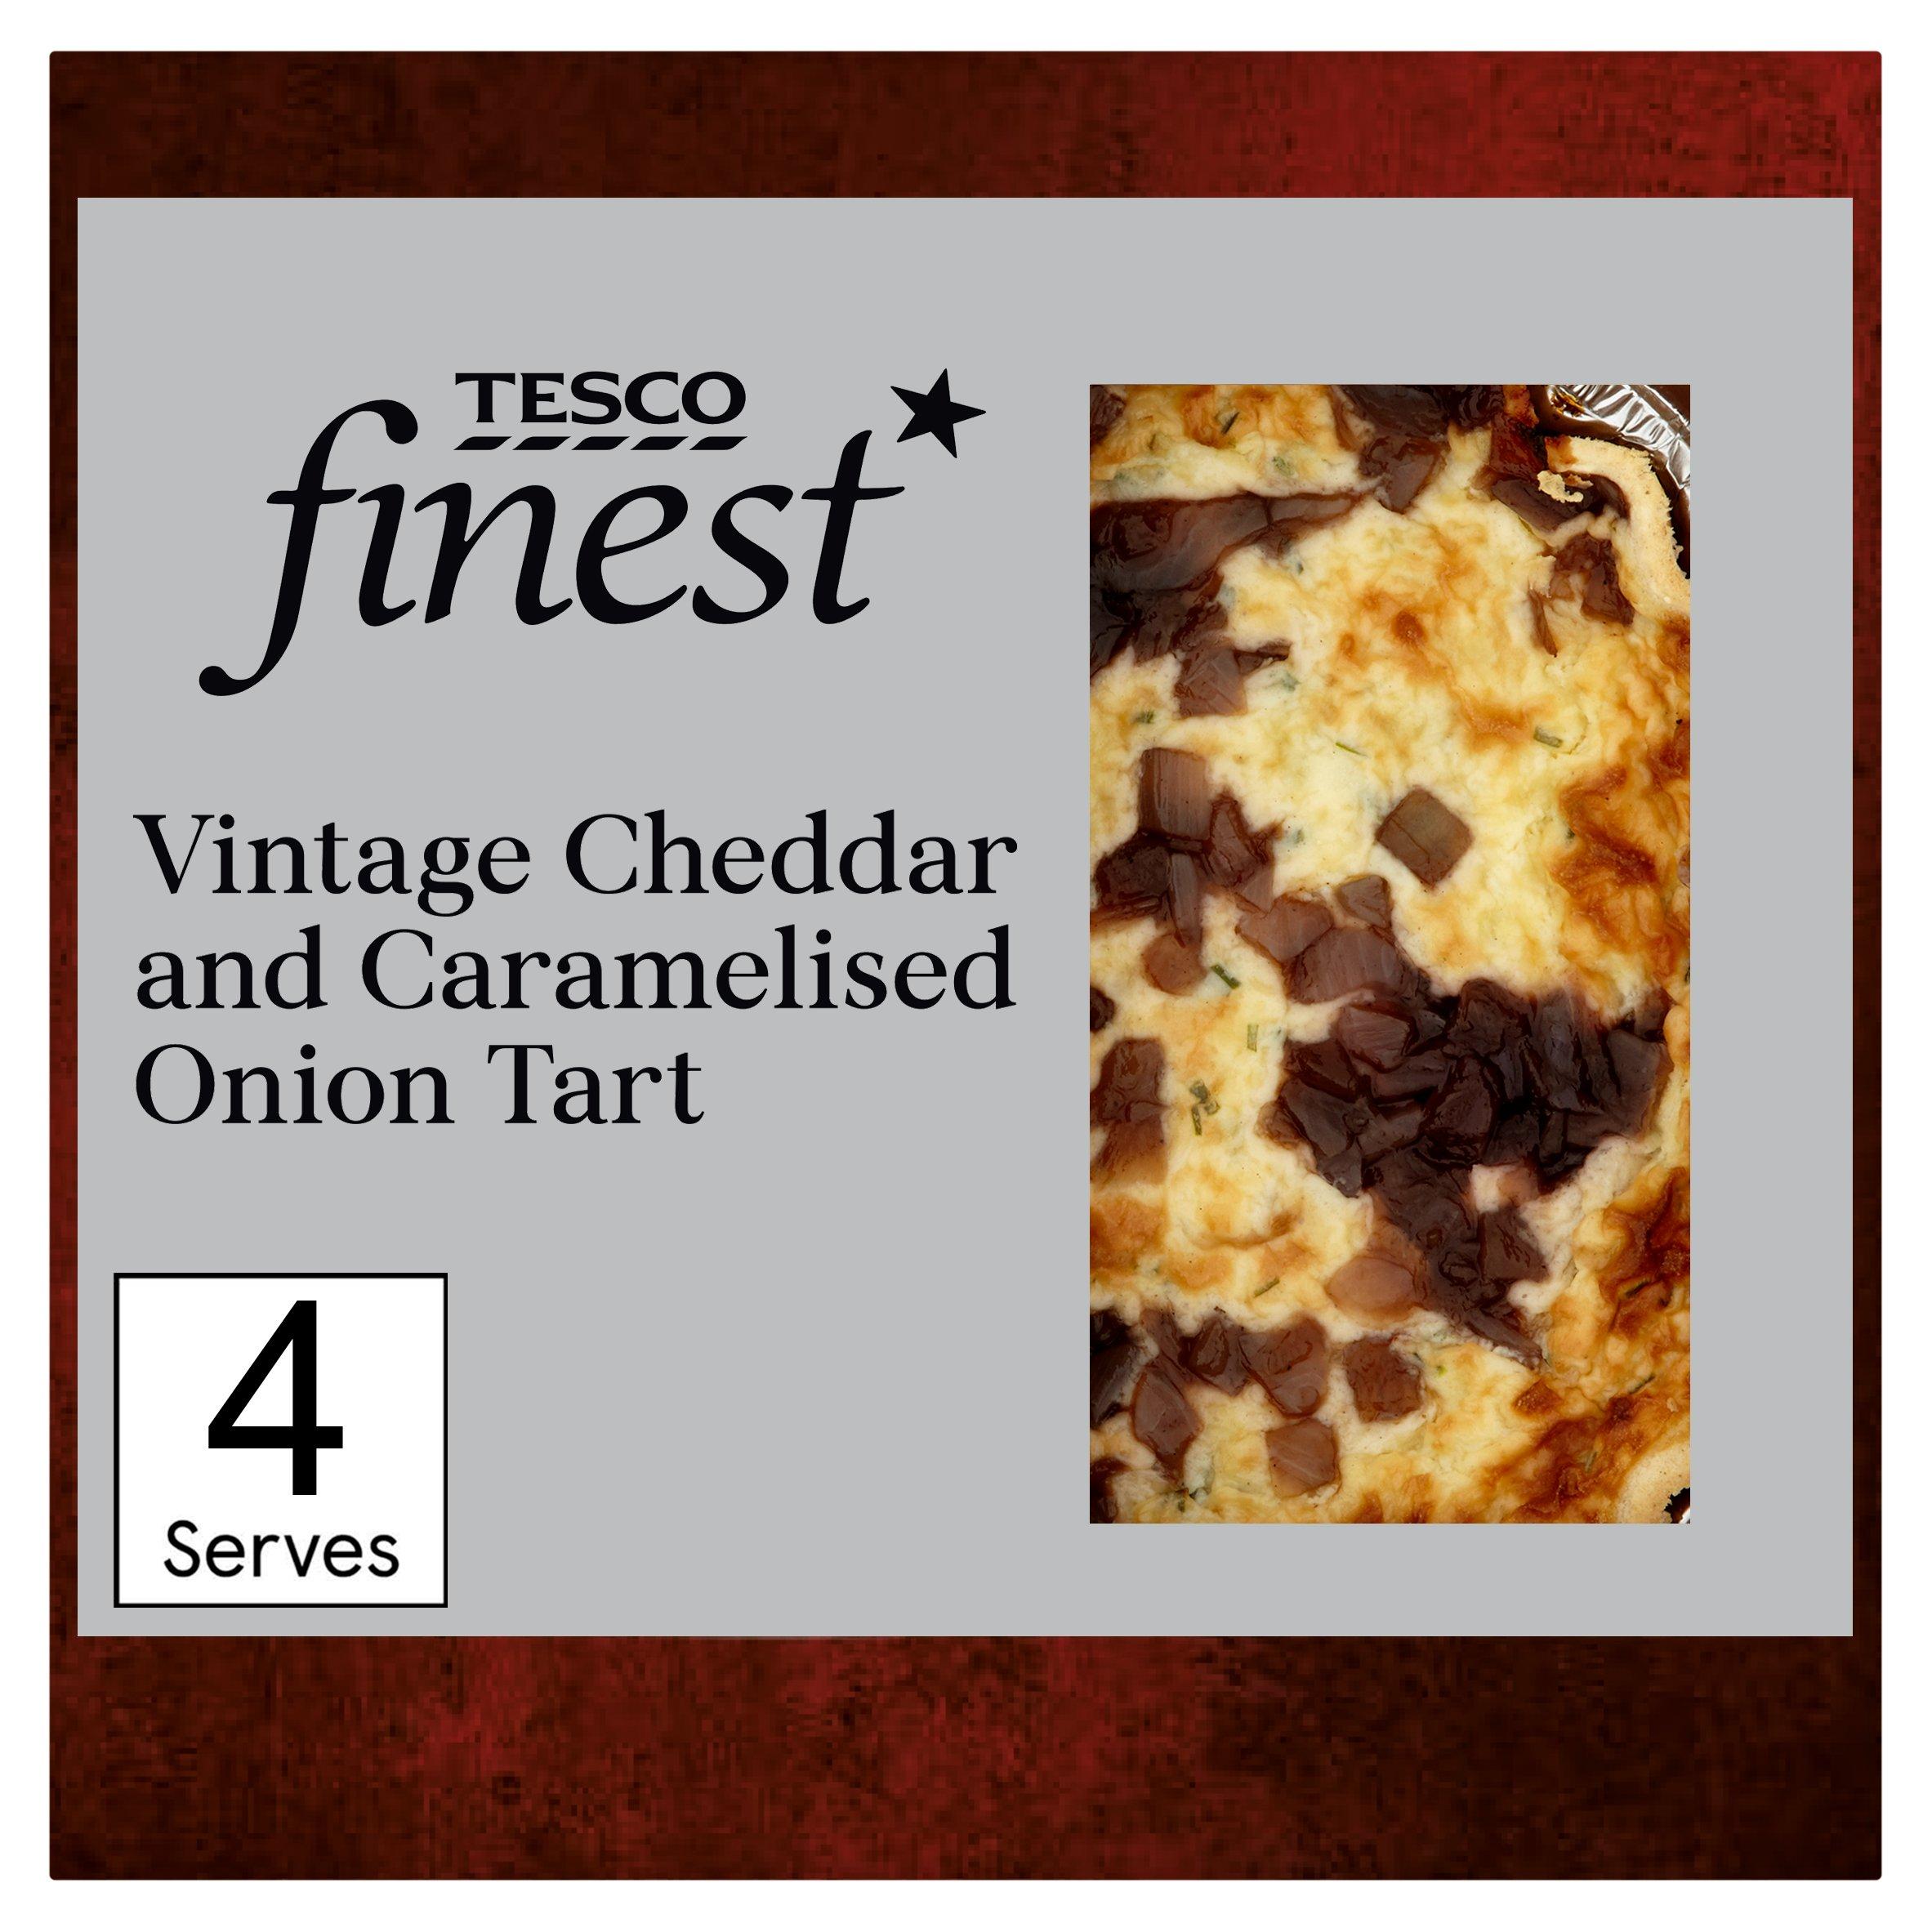 Tesco Finest Vintage Cheddar & Caramelised Onion Quiche400g